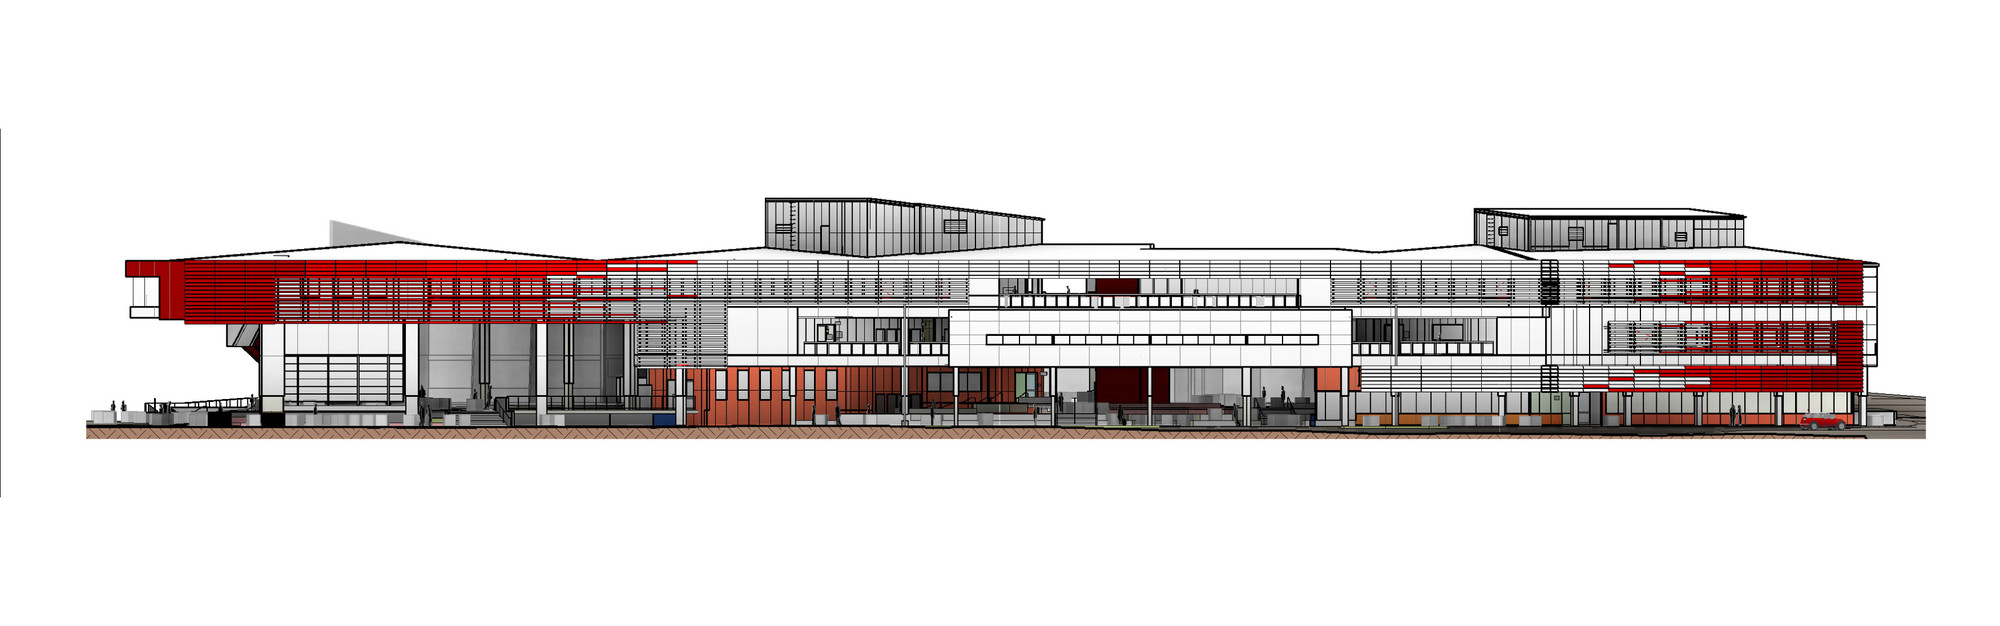 Gallery of Griffith University G11 Library  ThomsonAdsett